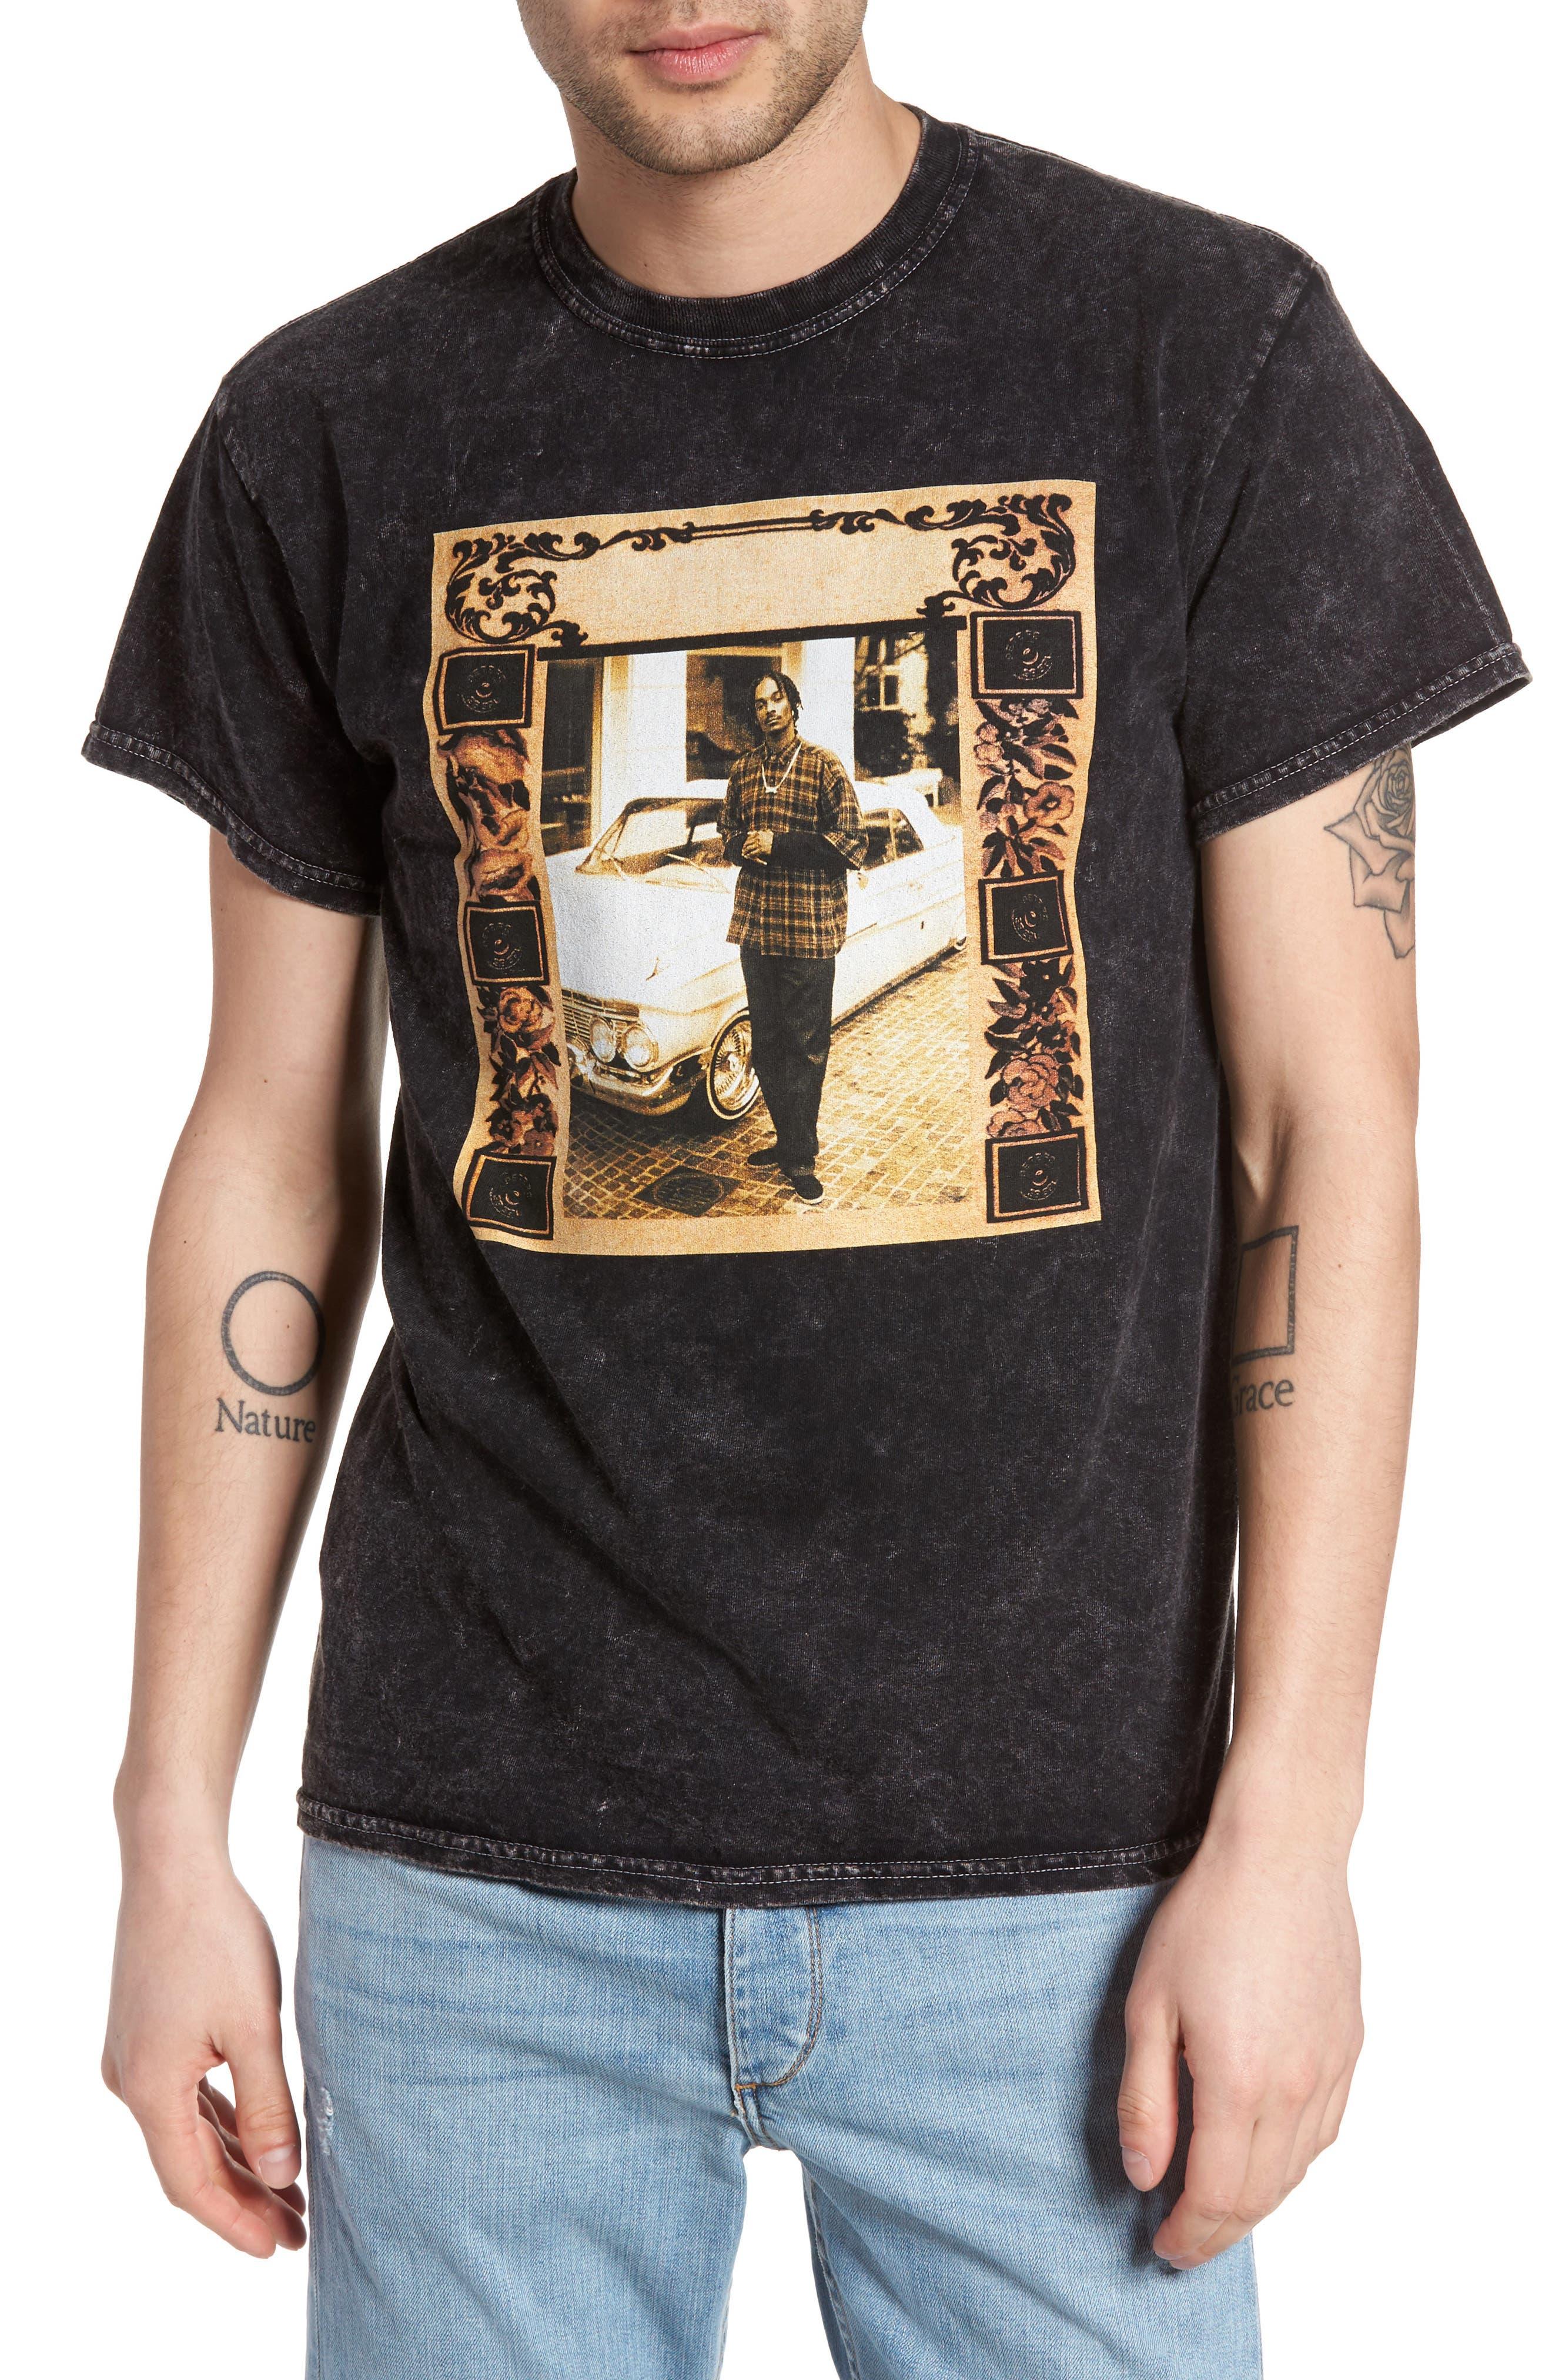 Main Image - The Rail Graphic T-Shirt